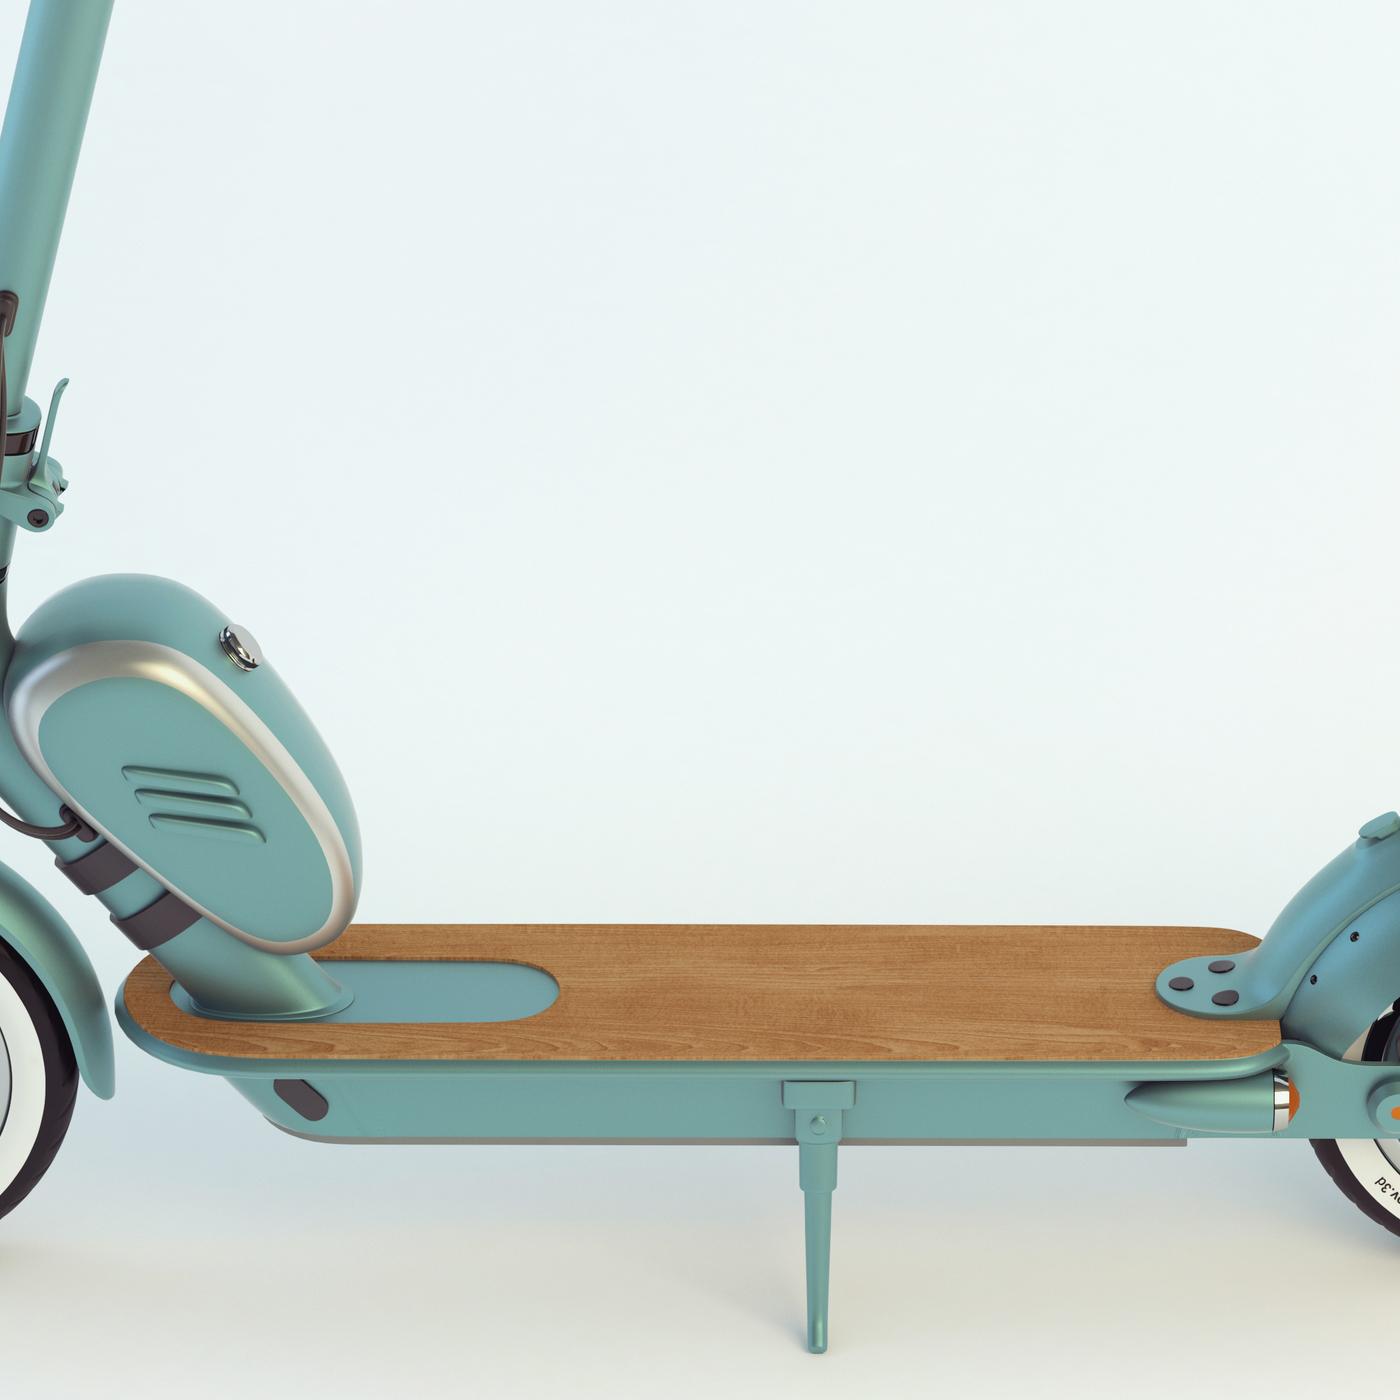 Scooter ( retro style design)